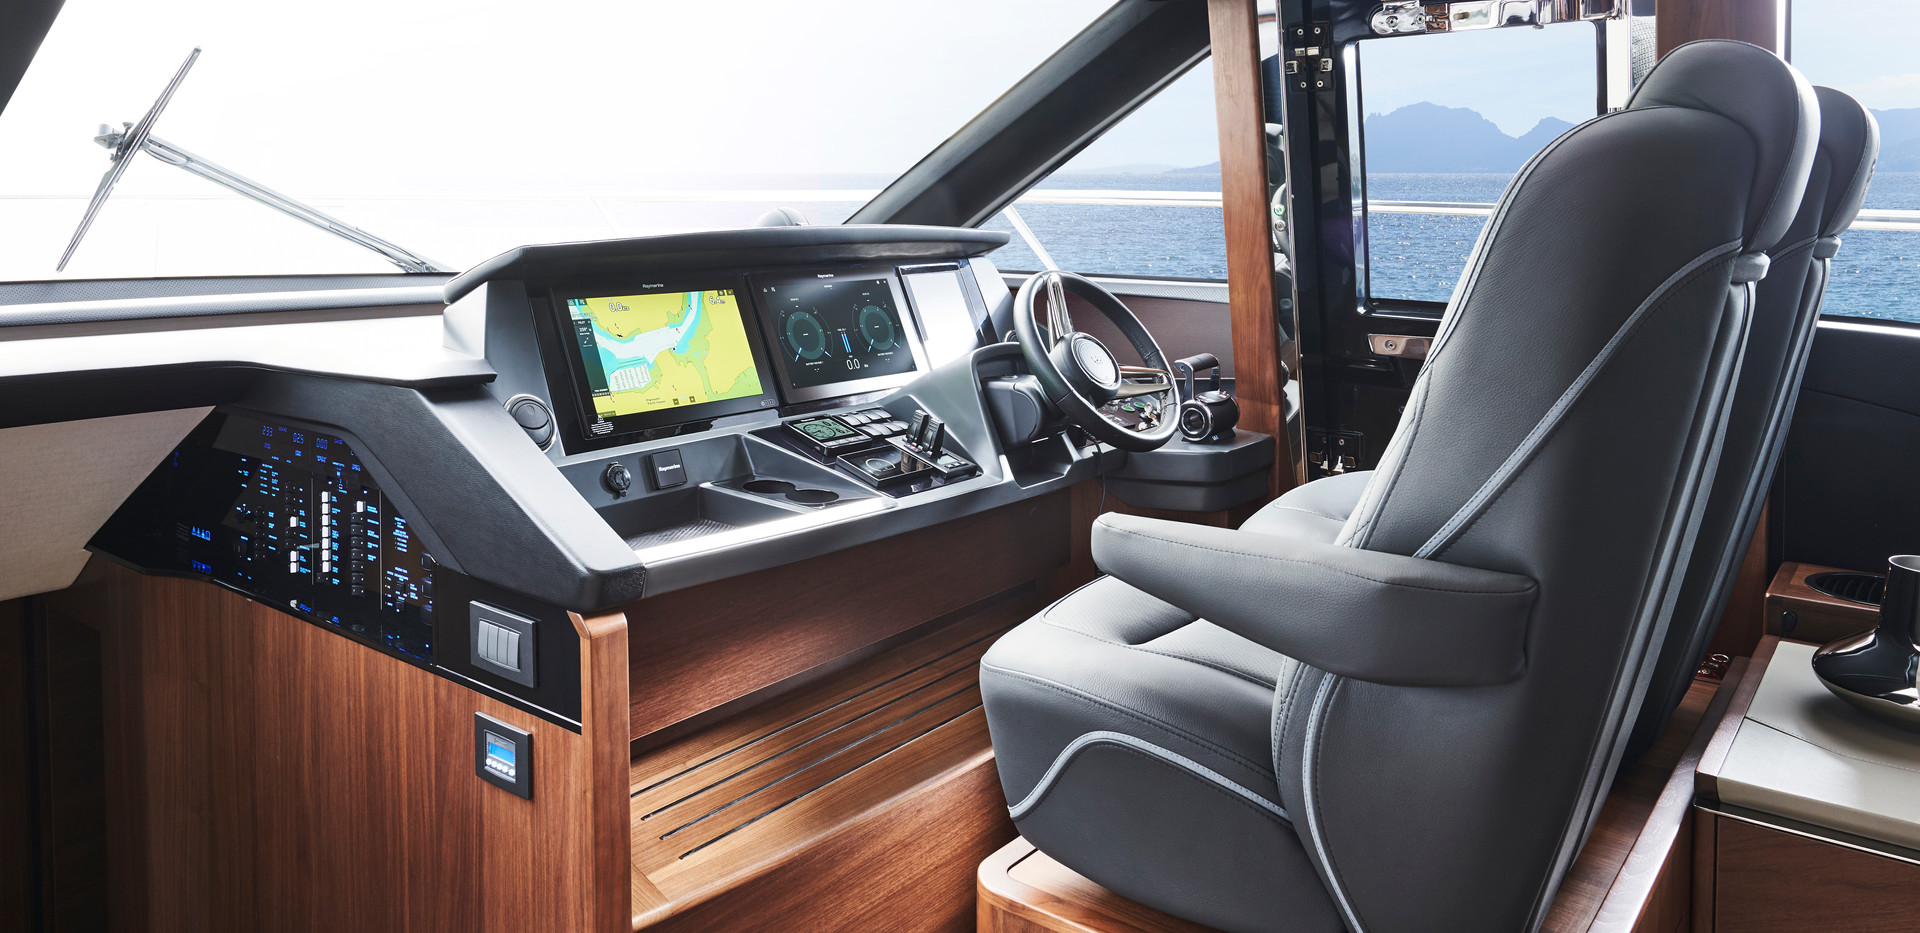 s66-interior-helm-walnut-satin.jpg